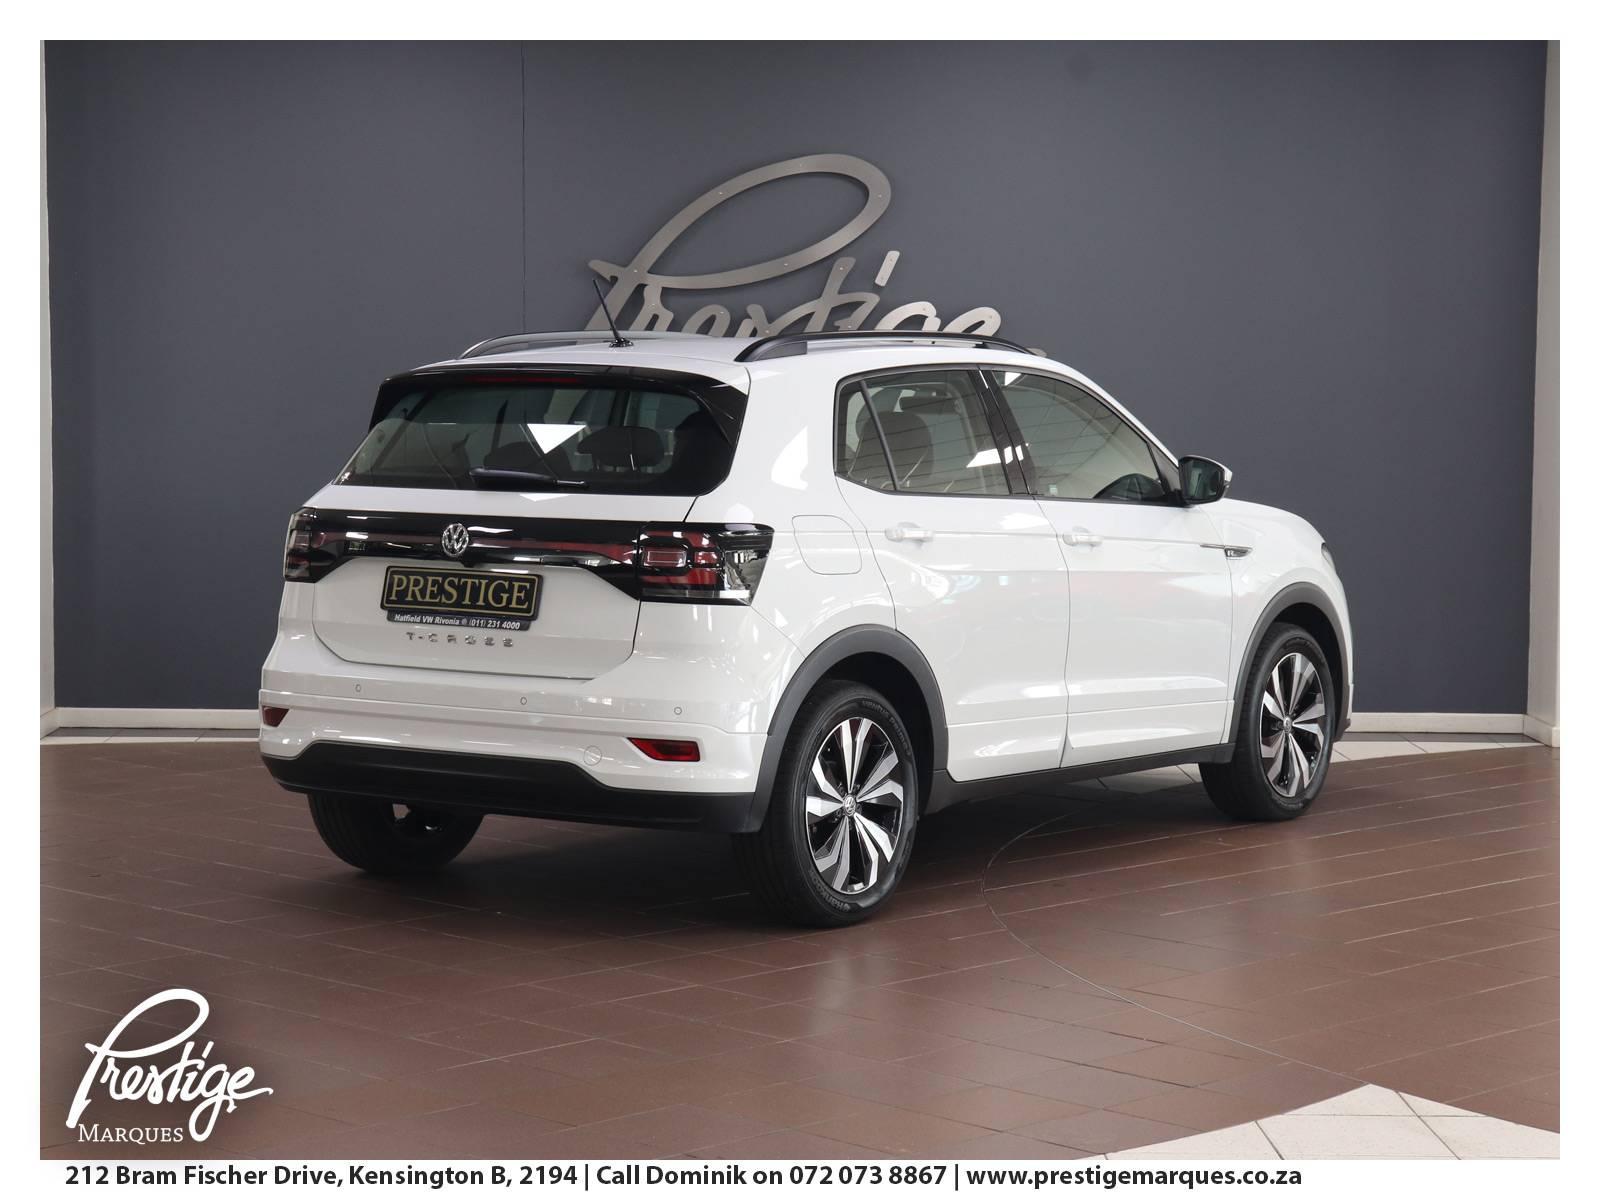 2019-Volkswagen-T-Cross-Prestige-Marques-Randburg-Sandton-3